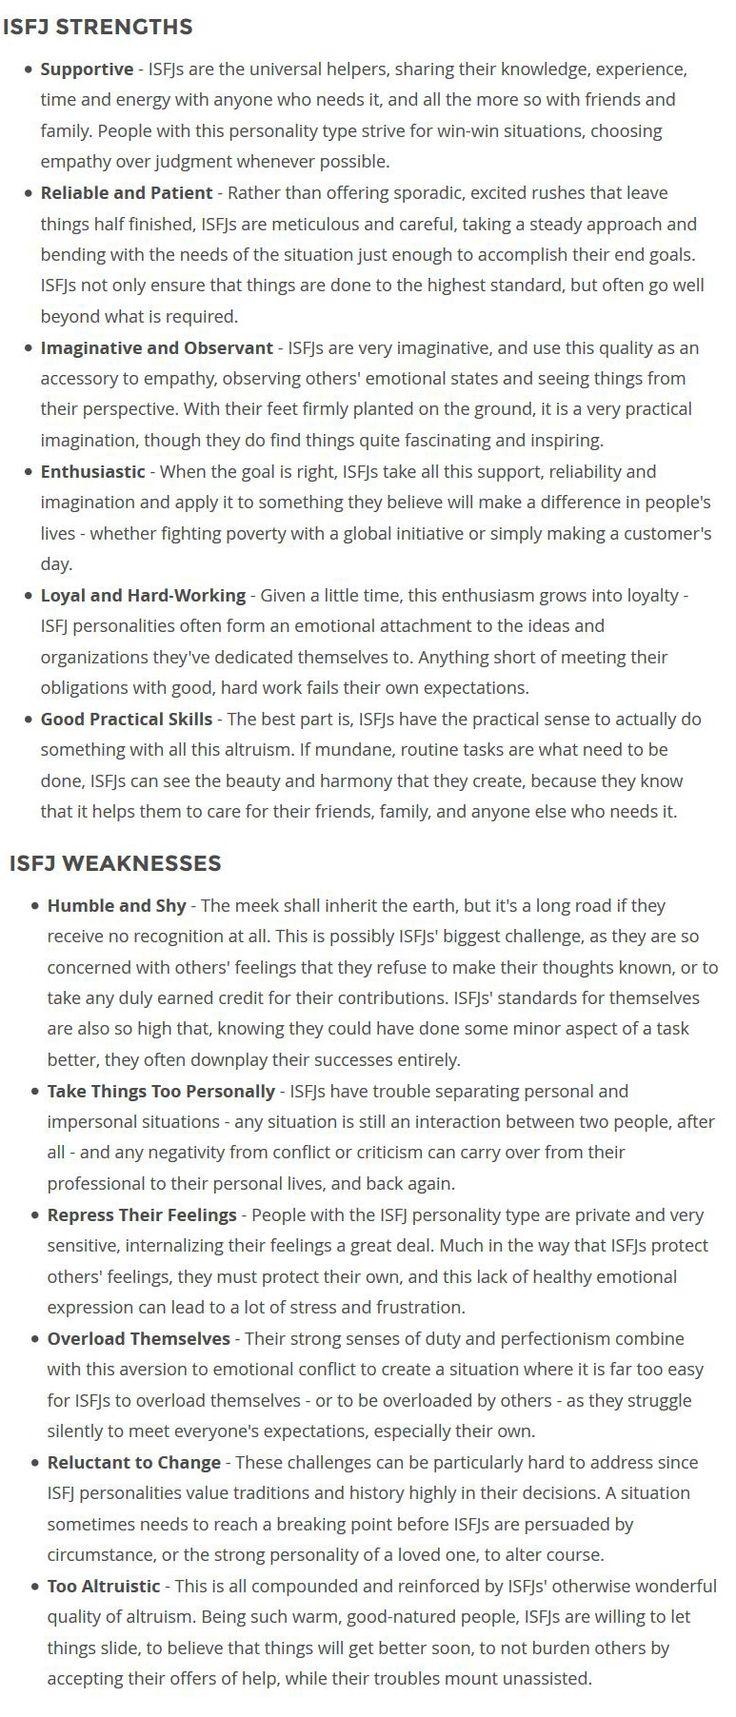 ISFJ Strengths & Weaknesses